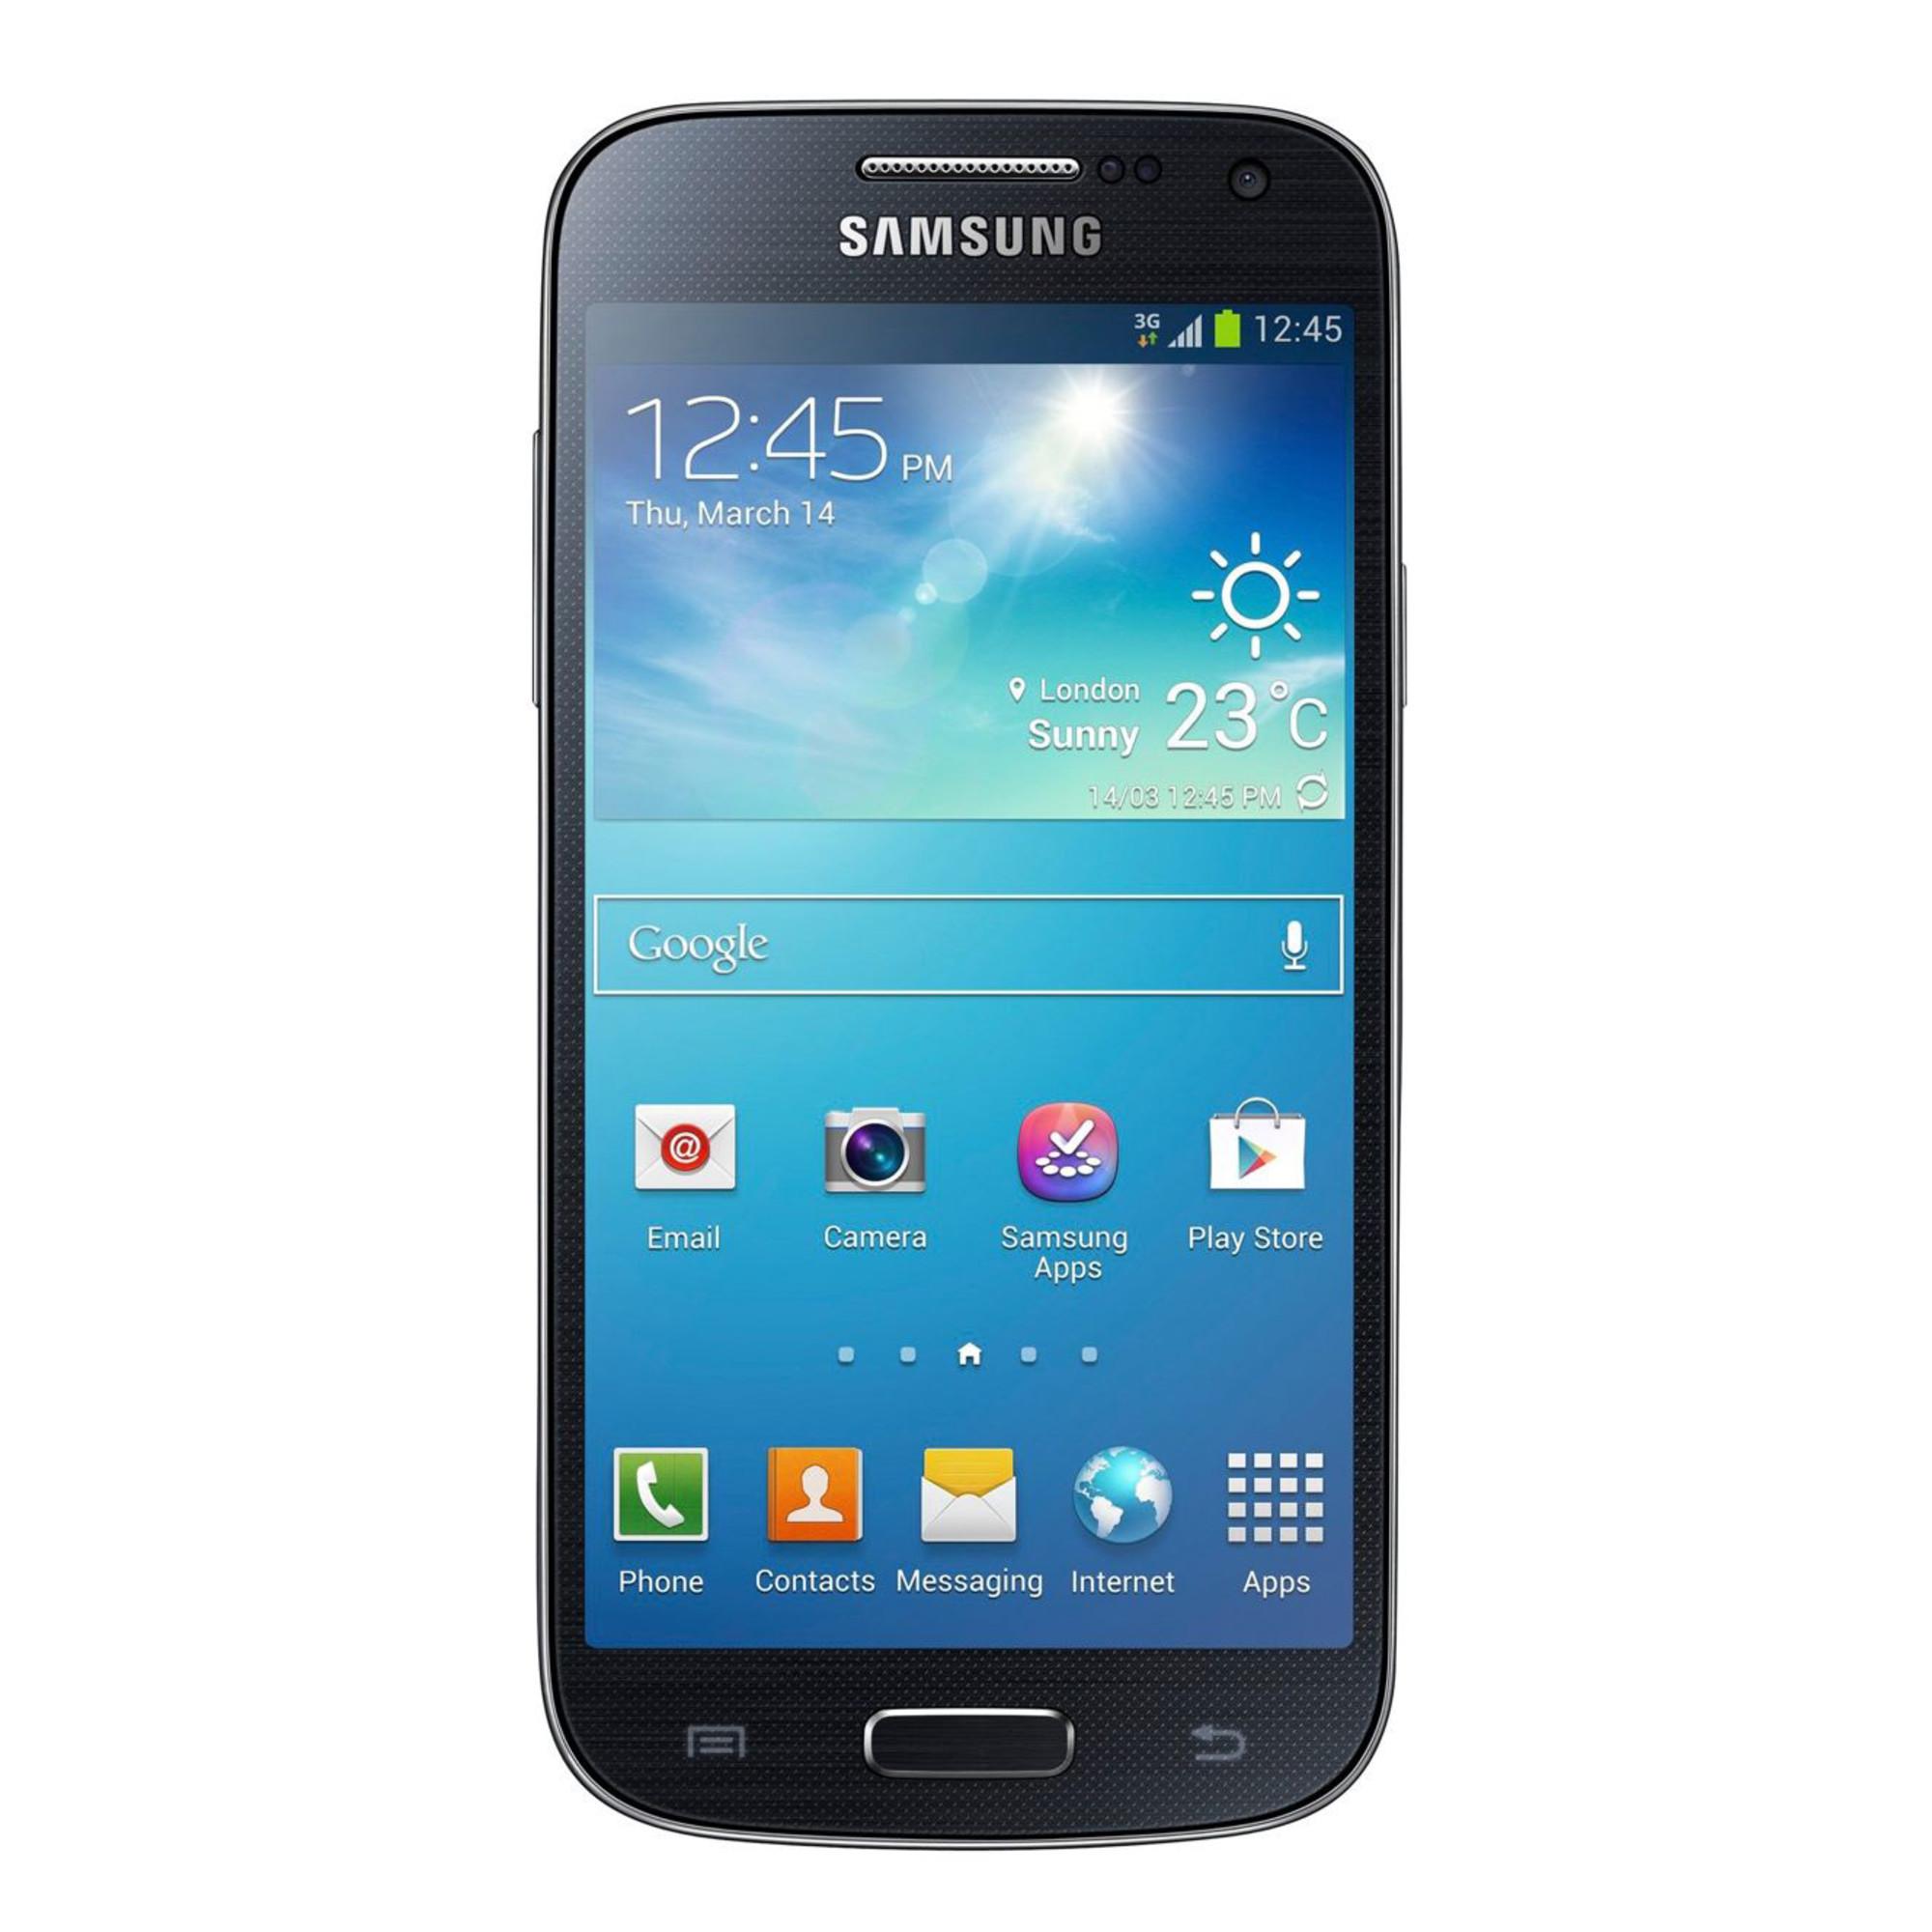 Samsung galaxy s4 mini geant casino